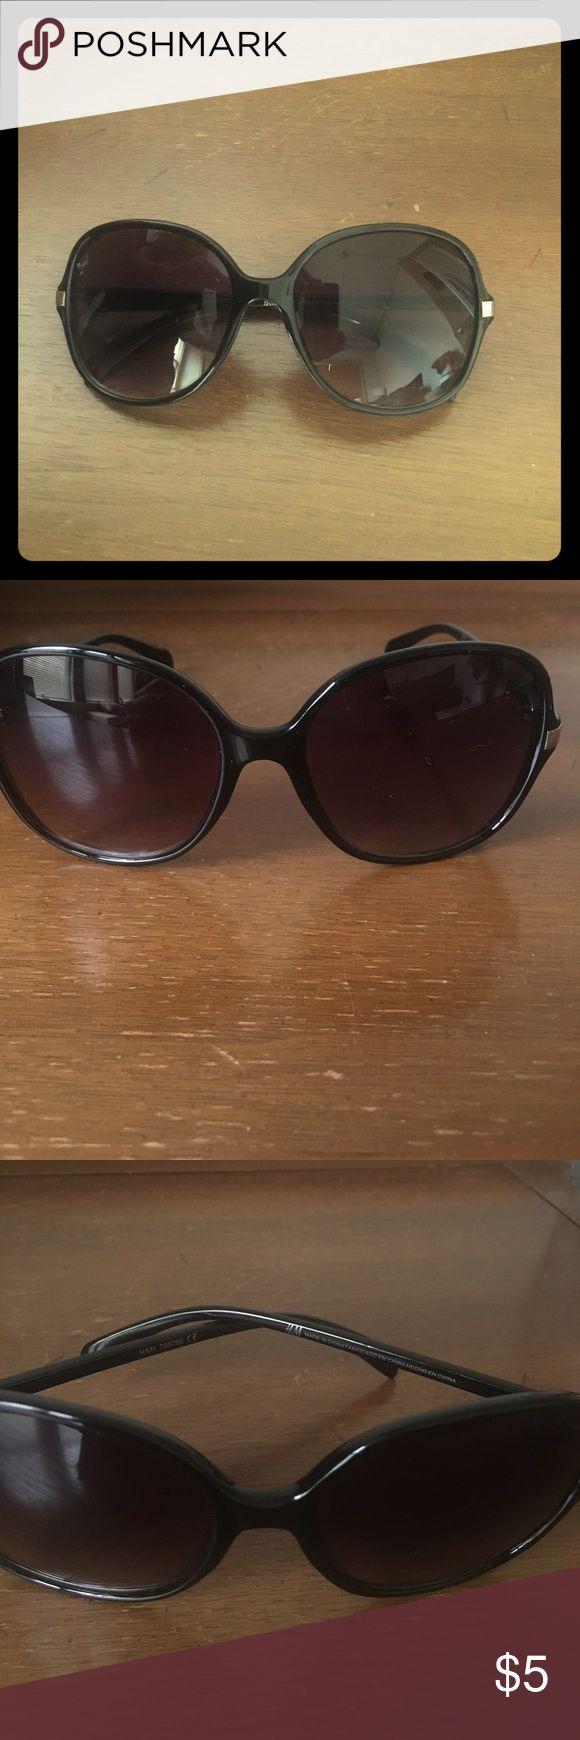 H&M black sunglasses Black oversized women's sunglasses. Worn once. Perfect condition. H&M Accessories Glasses